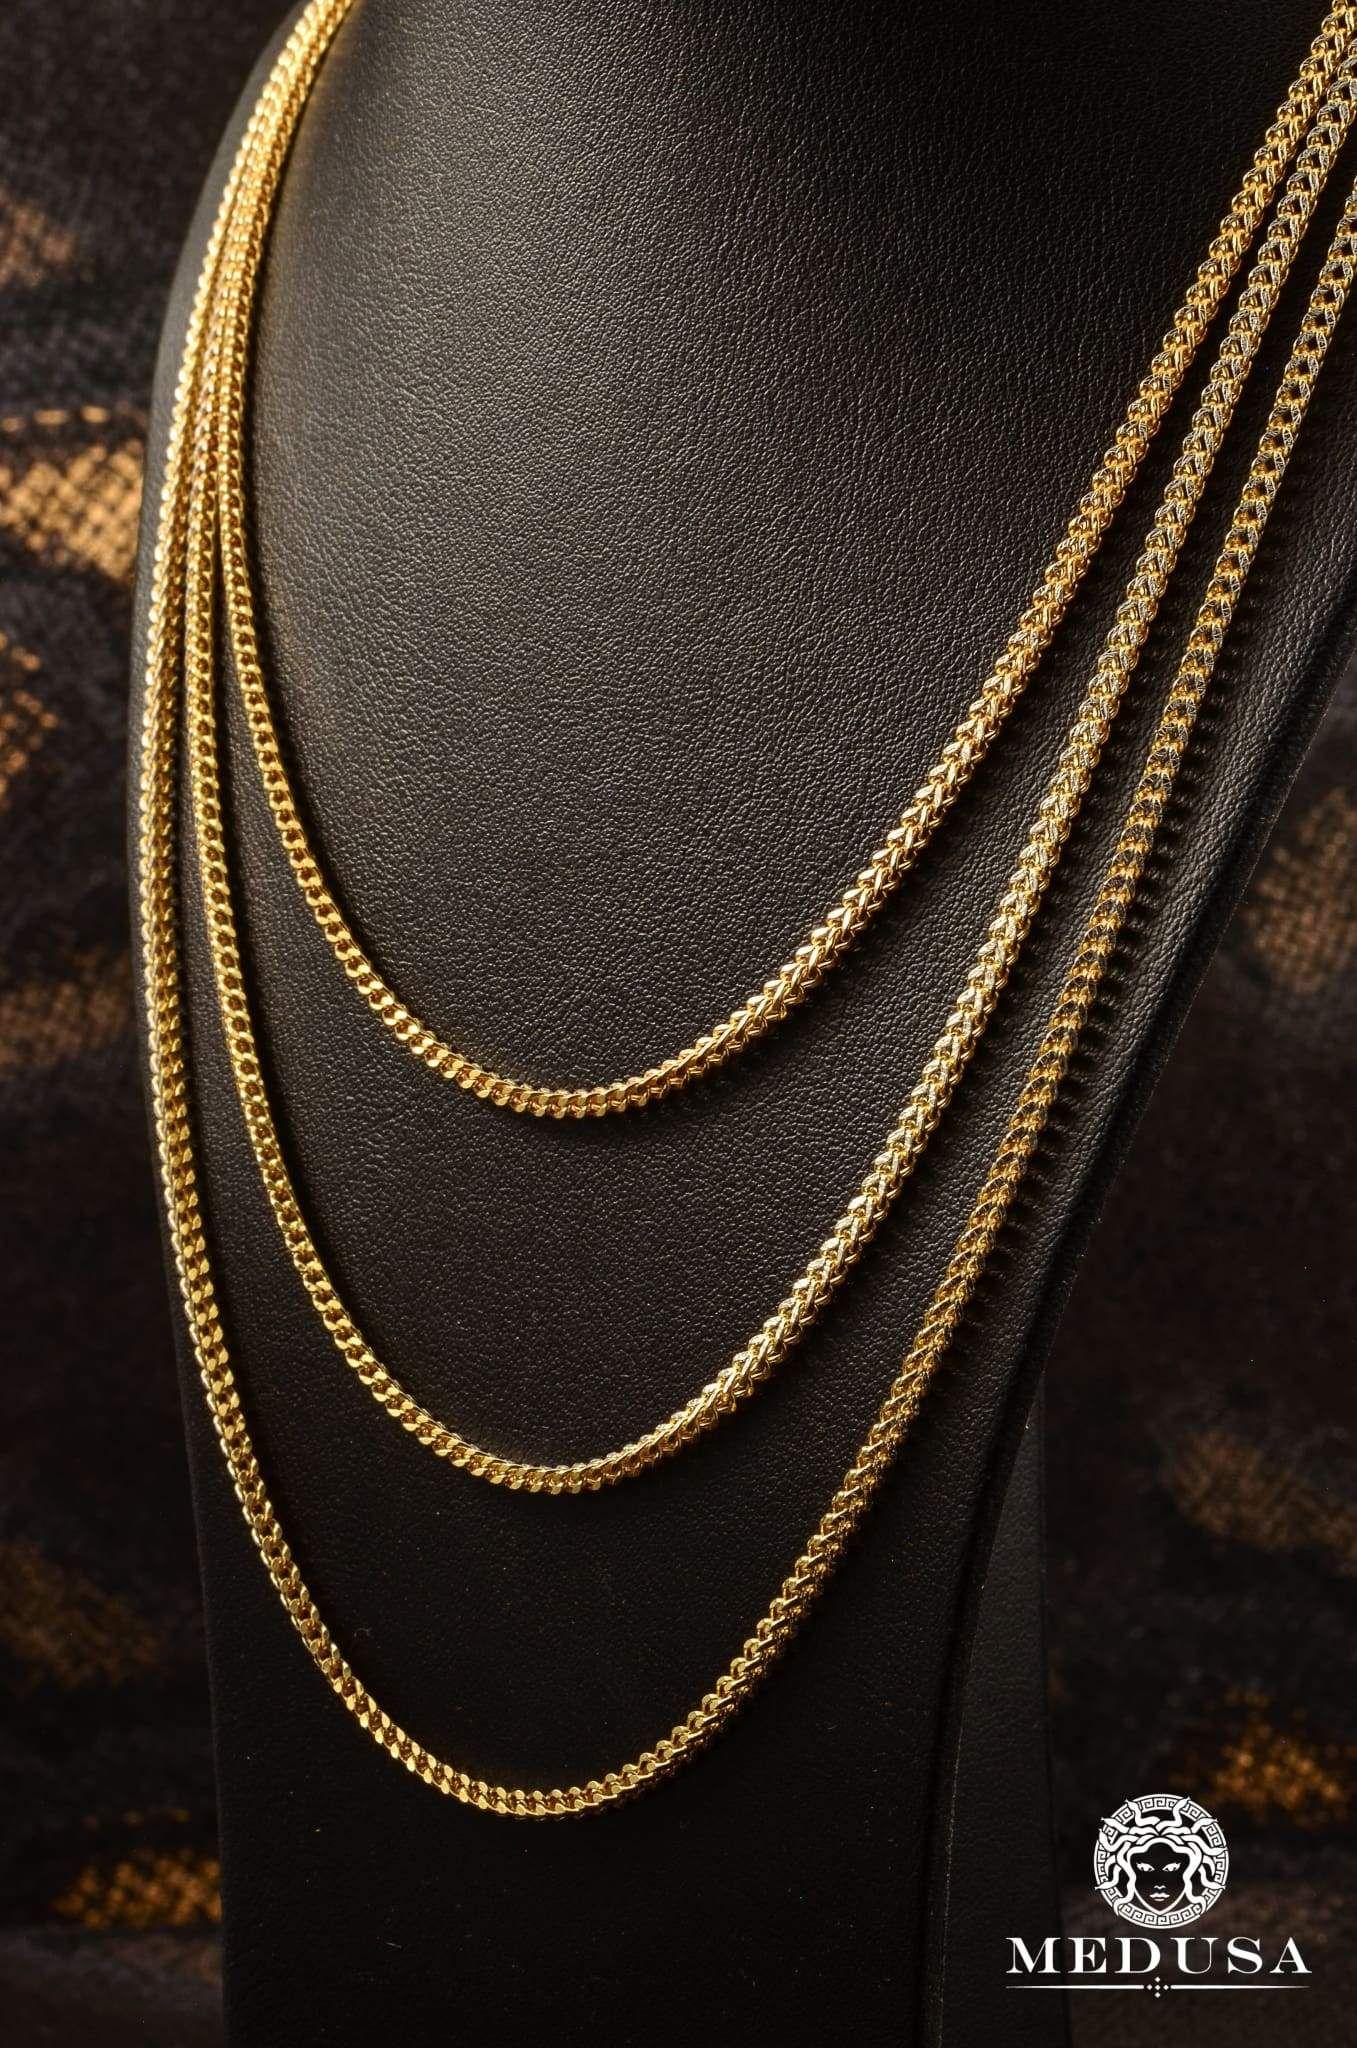 60073a878 Jewelry Gold chain chain Franco Unisex-2mm-Franco Diamond Cut Chain Jewelry  Medusa-